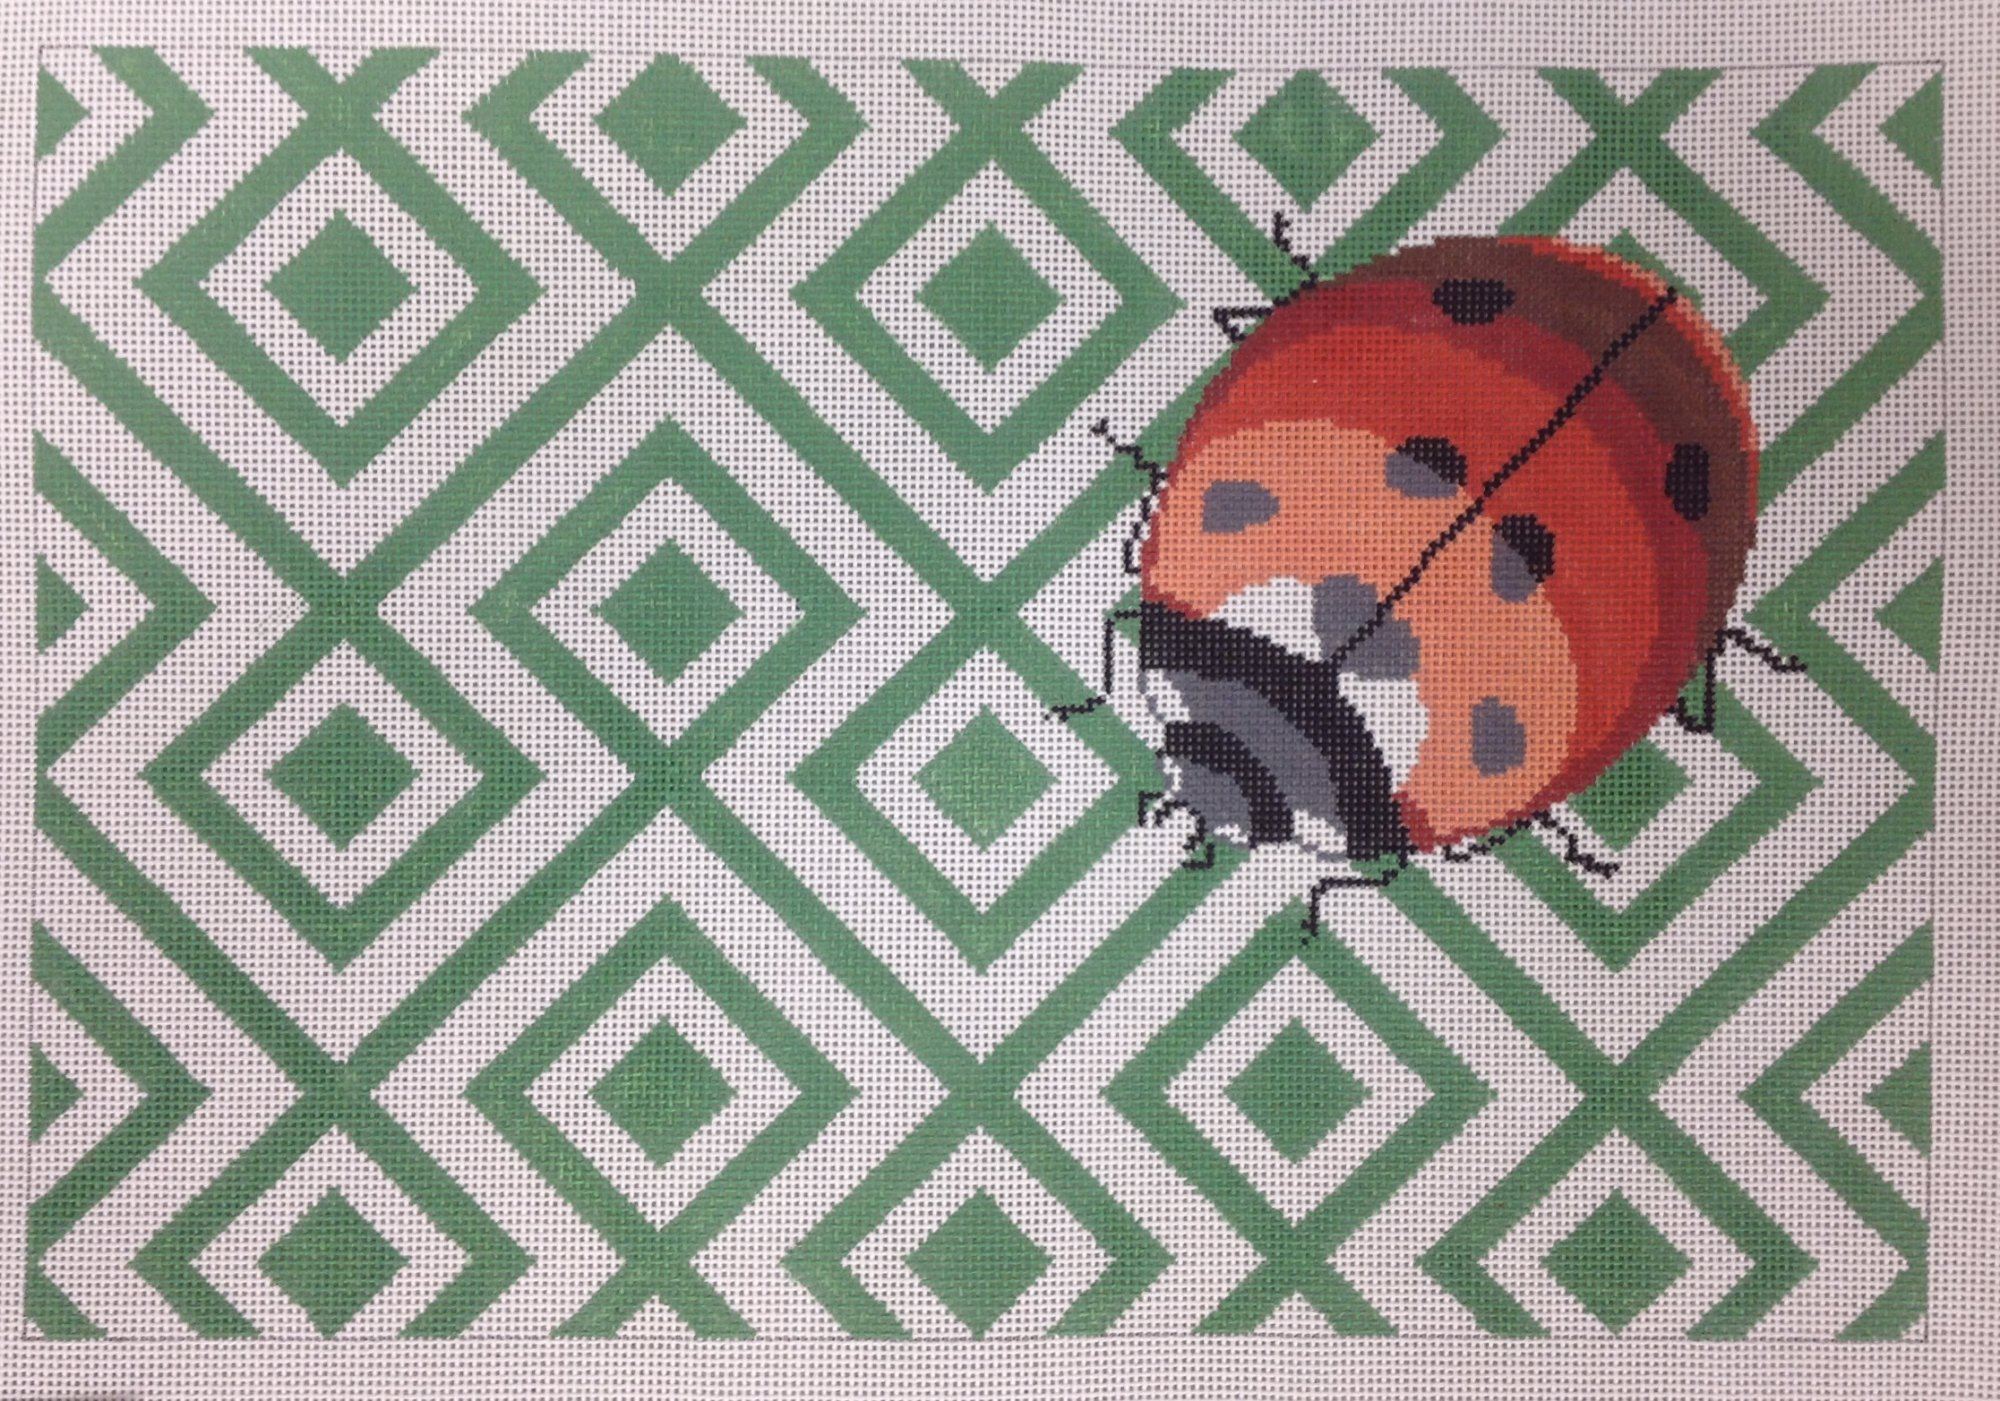 fly away home (ladybug)*